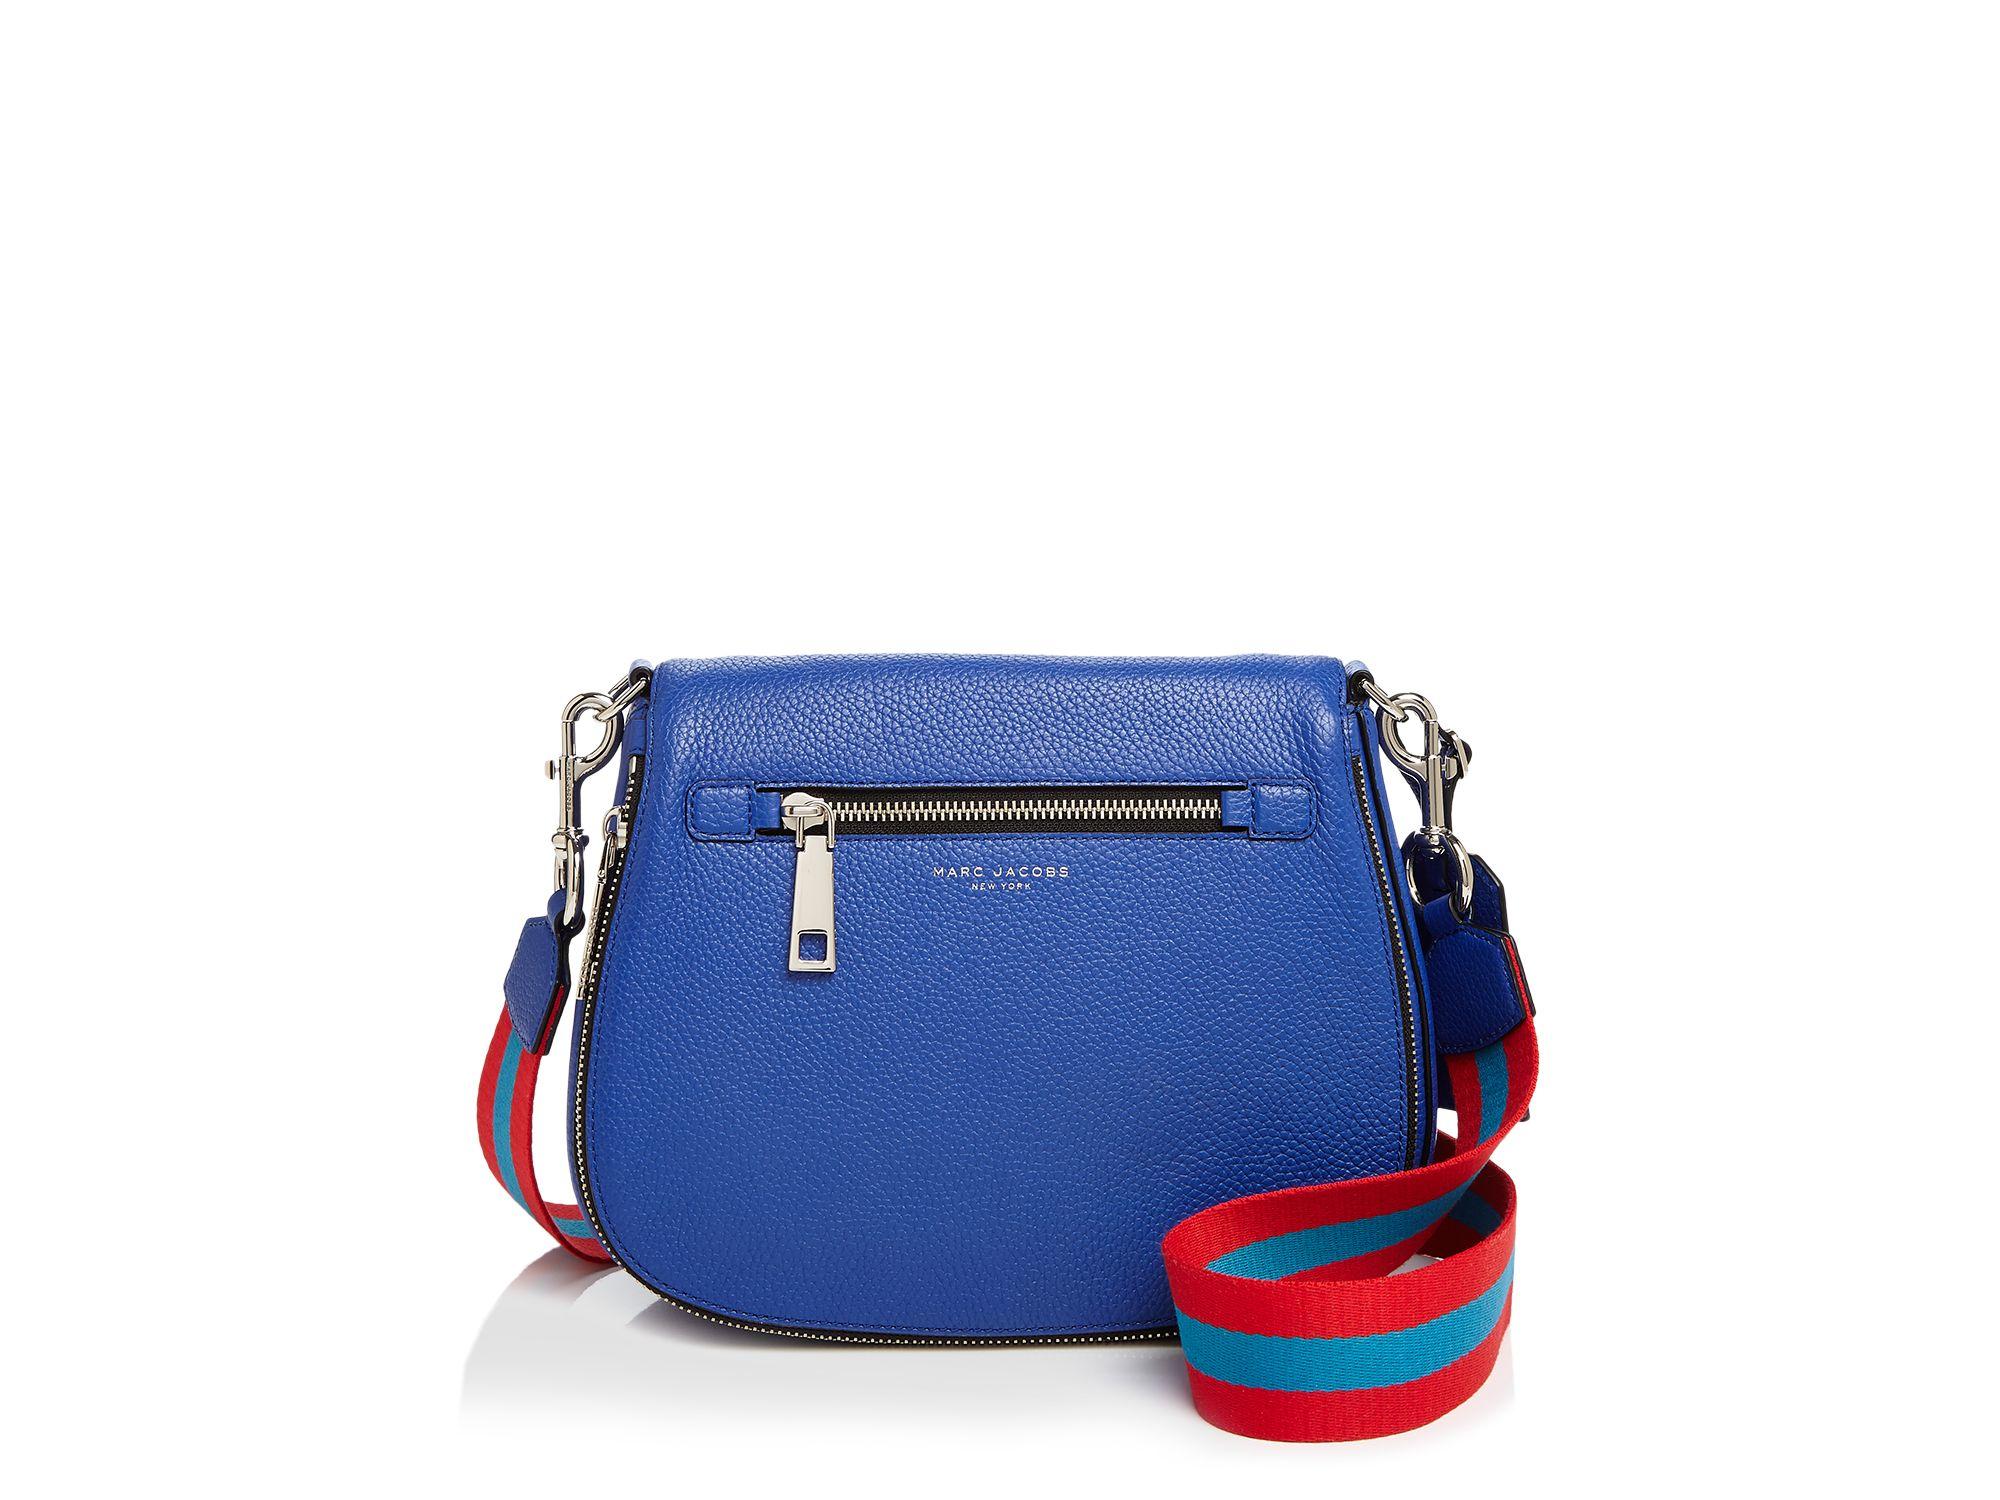 255fc2edeee7 Lyst - Marc Jacobs Gotham City Saddle Bag in Blue